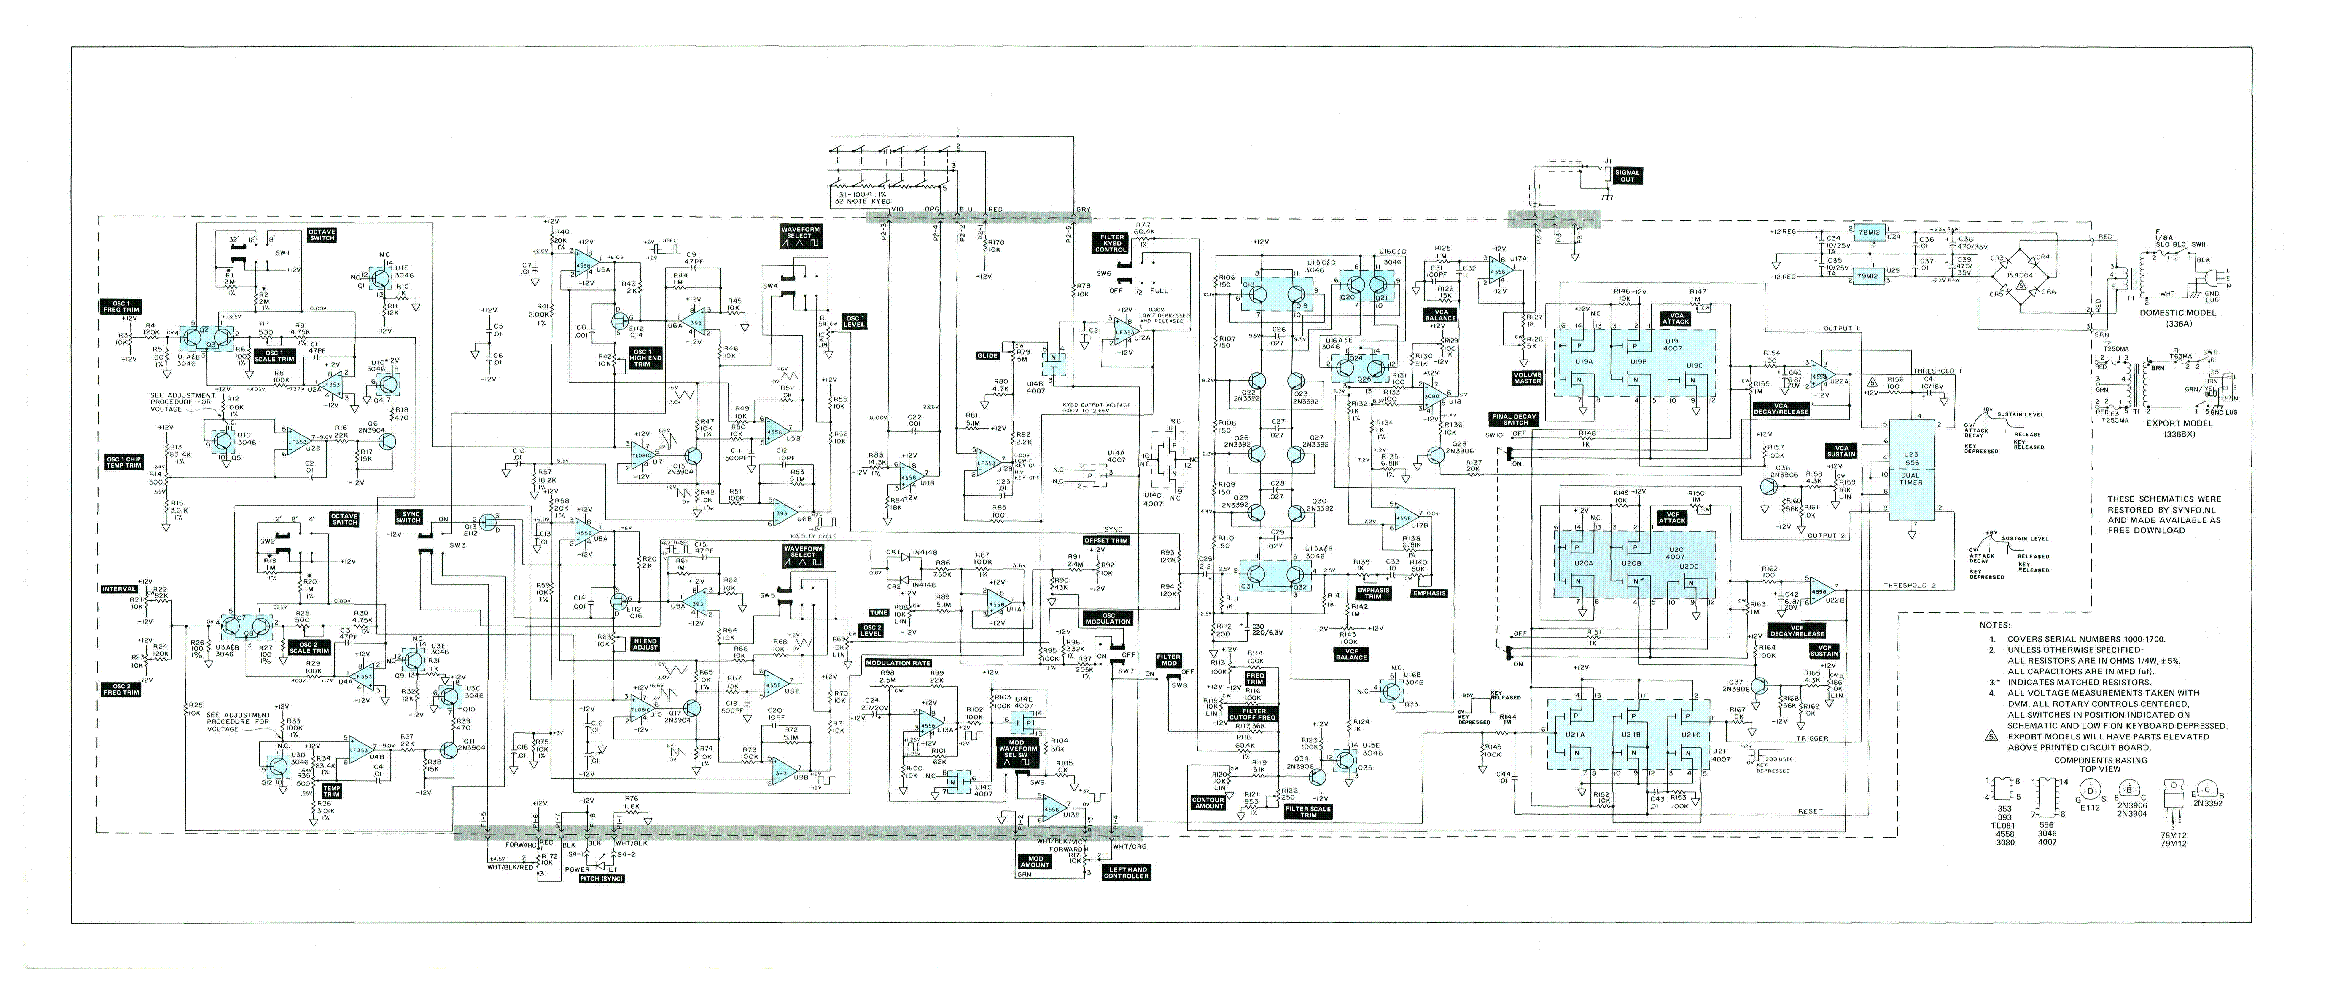 MOOG PRODIGY SCH Service Manual download, schematics, eeprom